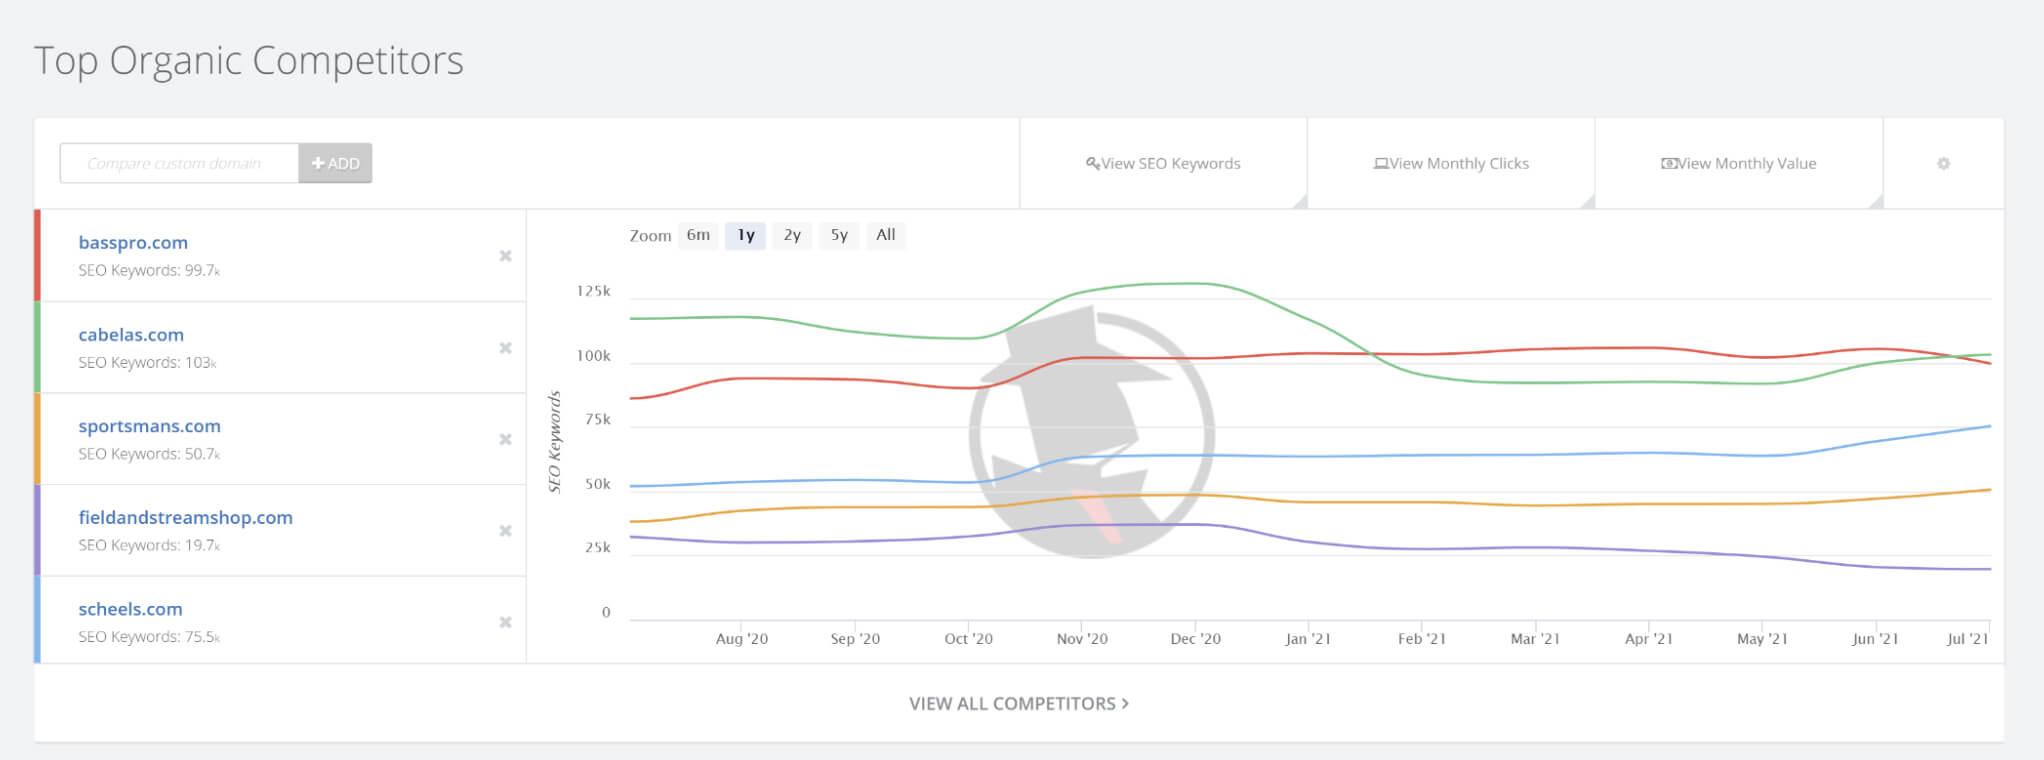 SpyFu top organic competitors screen-shot